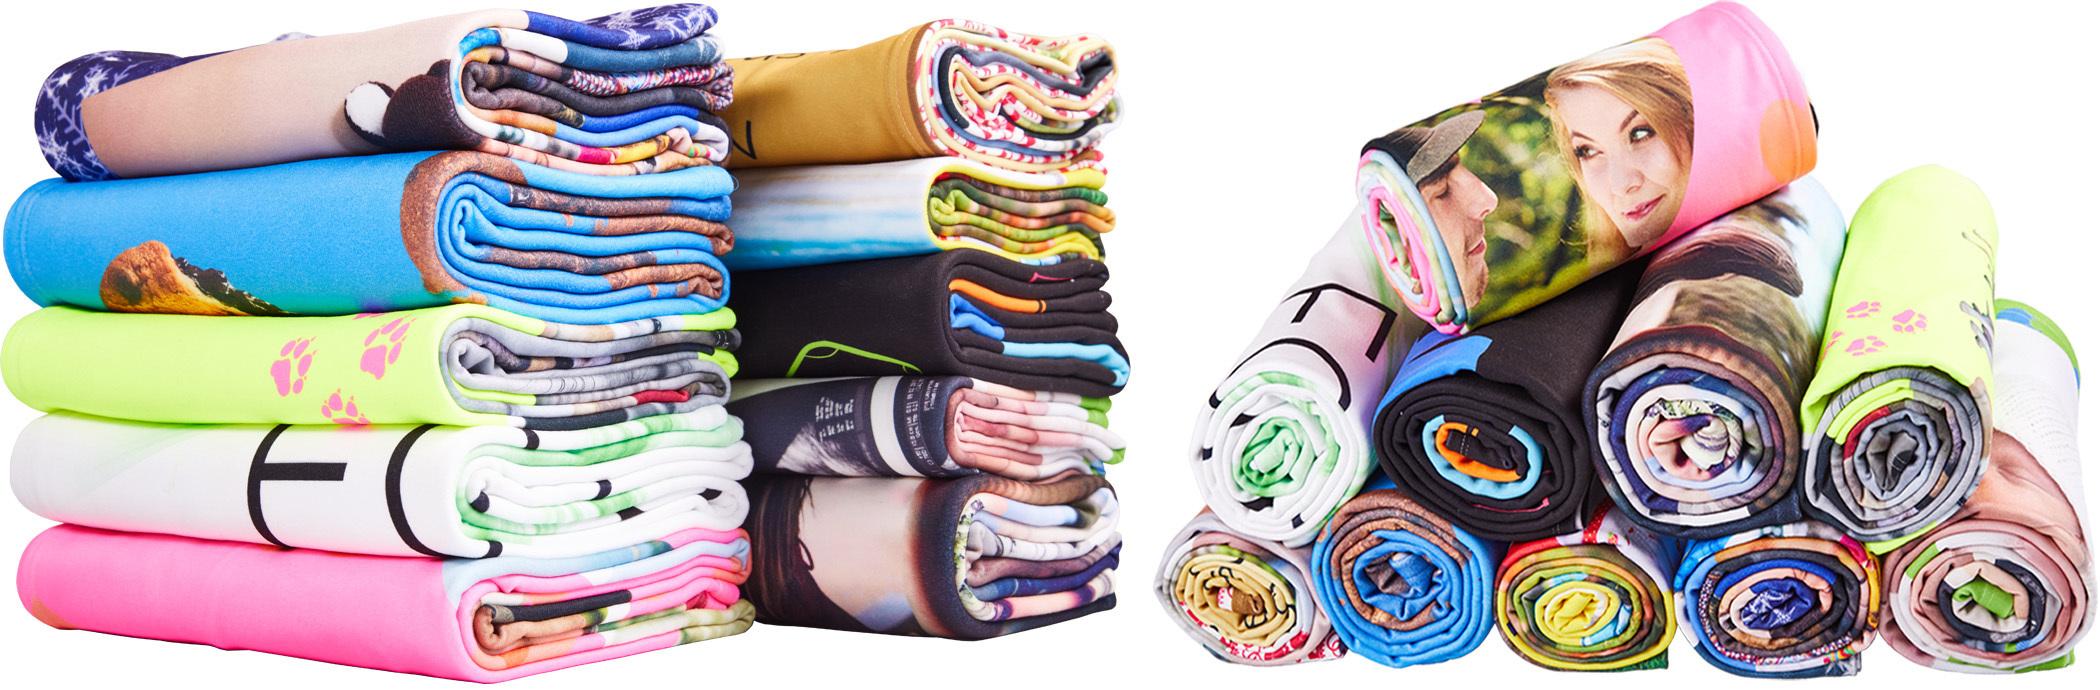 deky v kategorii